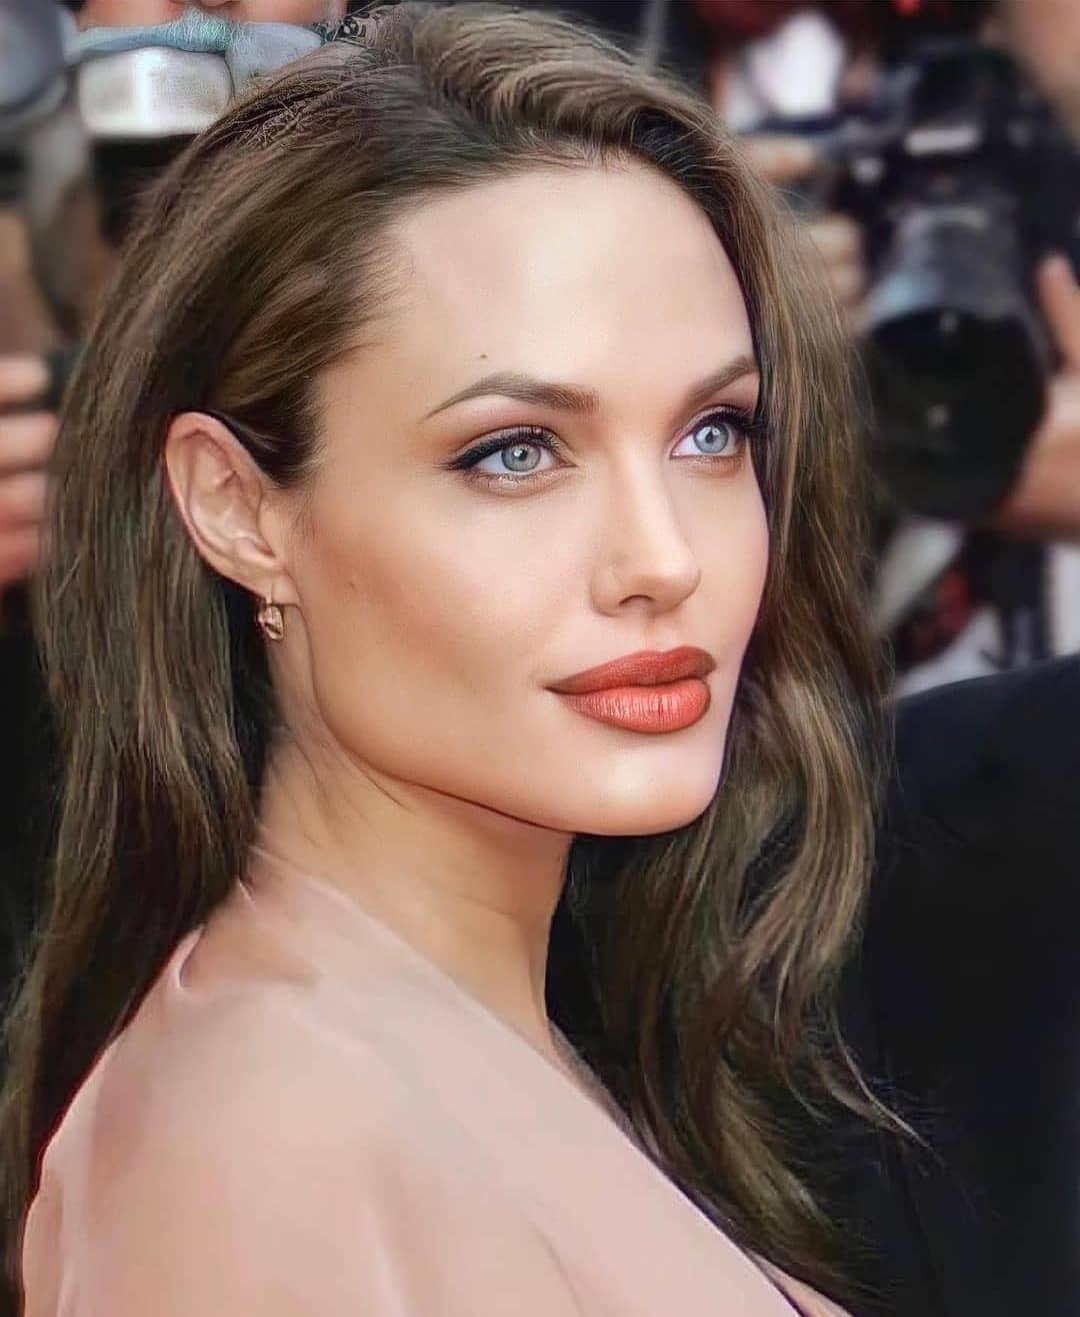 У Джолі немає коханця / instagram.com/angelinajolie_offiicial